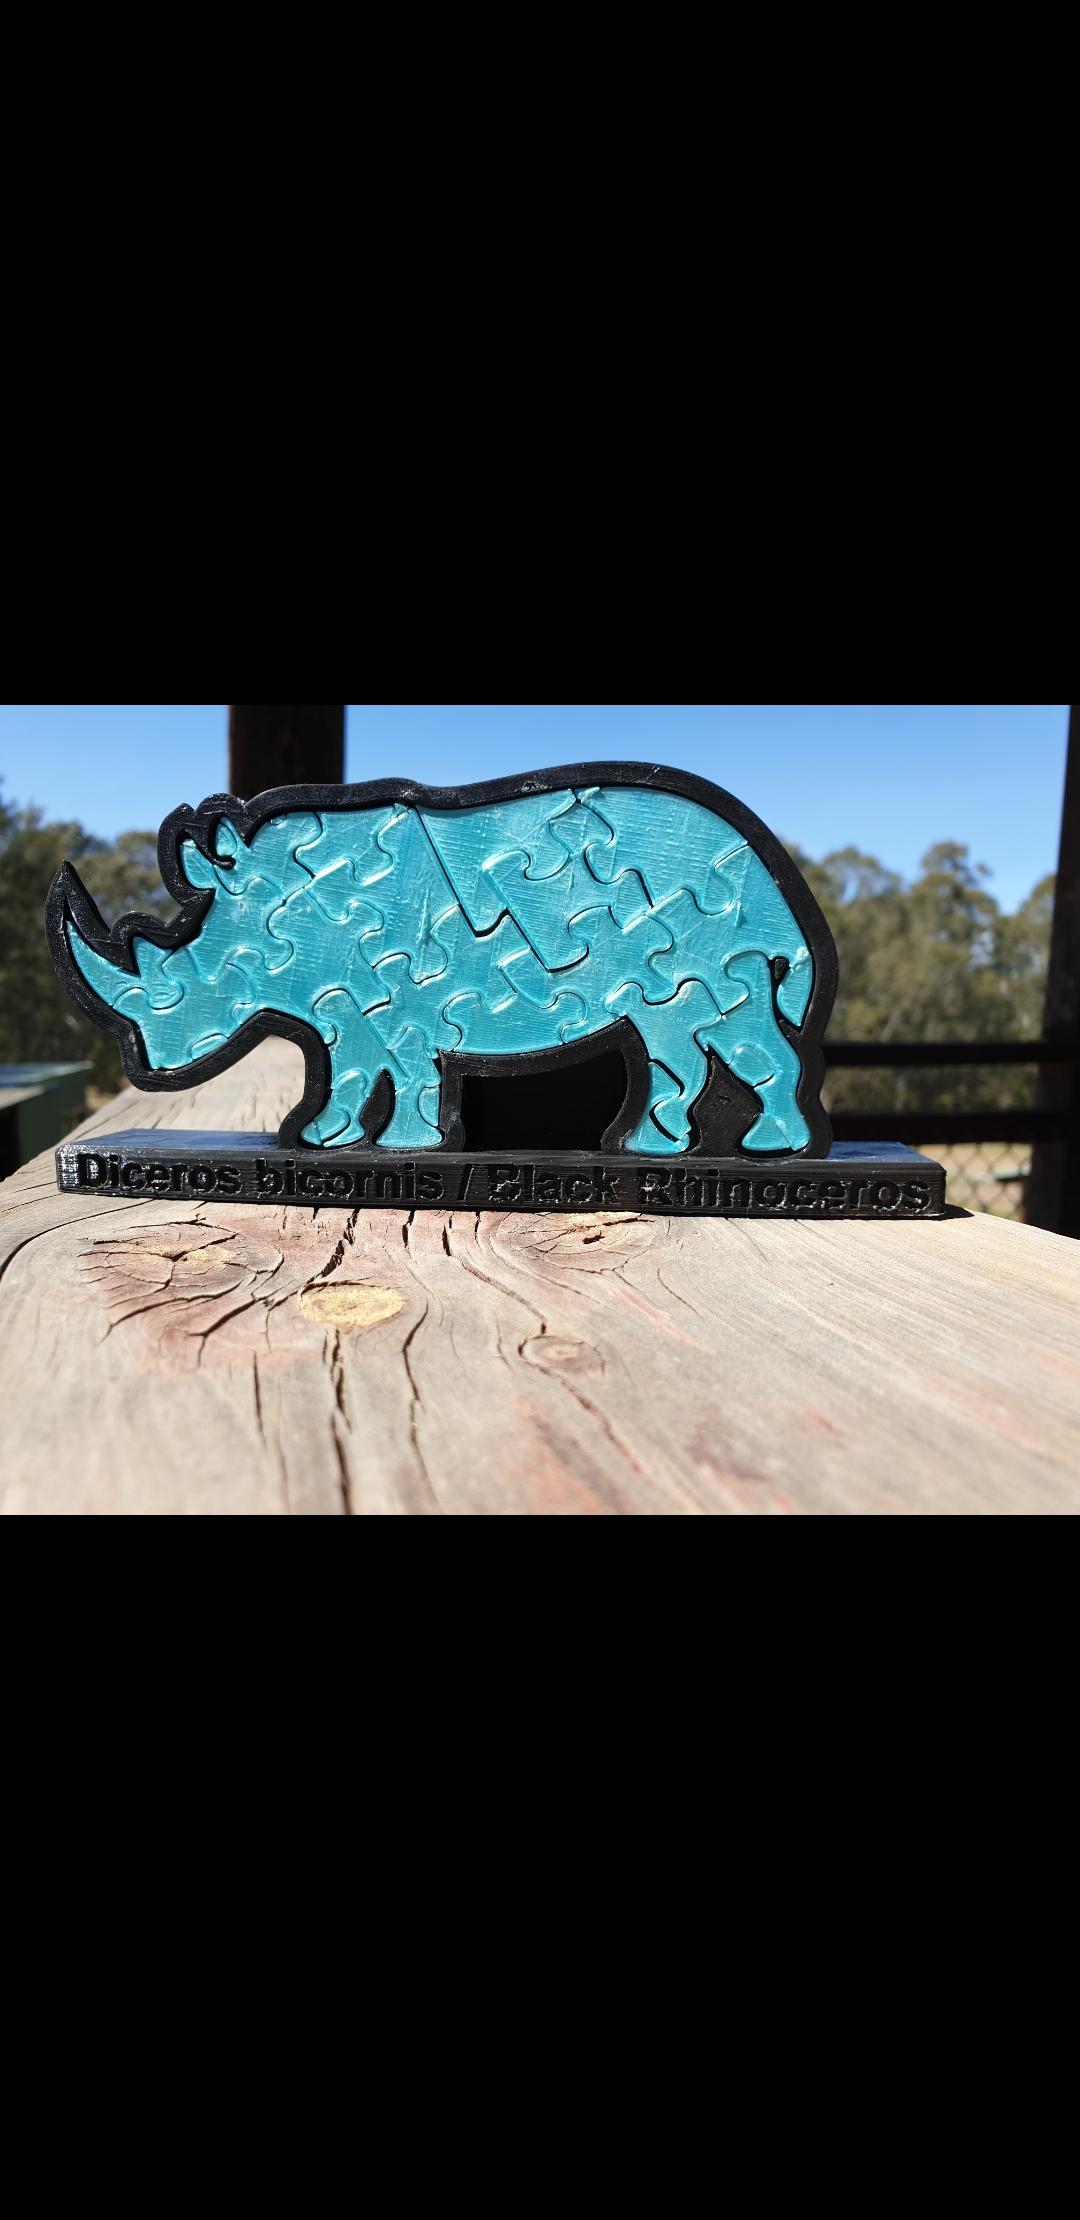 Screenshot_20190930-123334_Gallery.jpg Download free STL file Rhinoceros Puzzle • Template to 3D print, Renee_Taylor